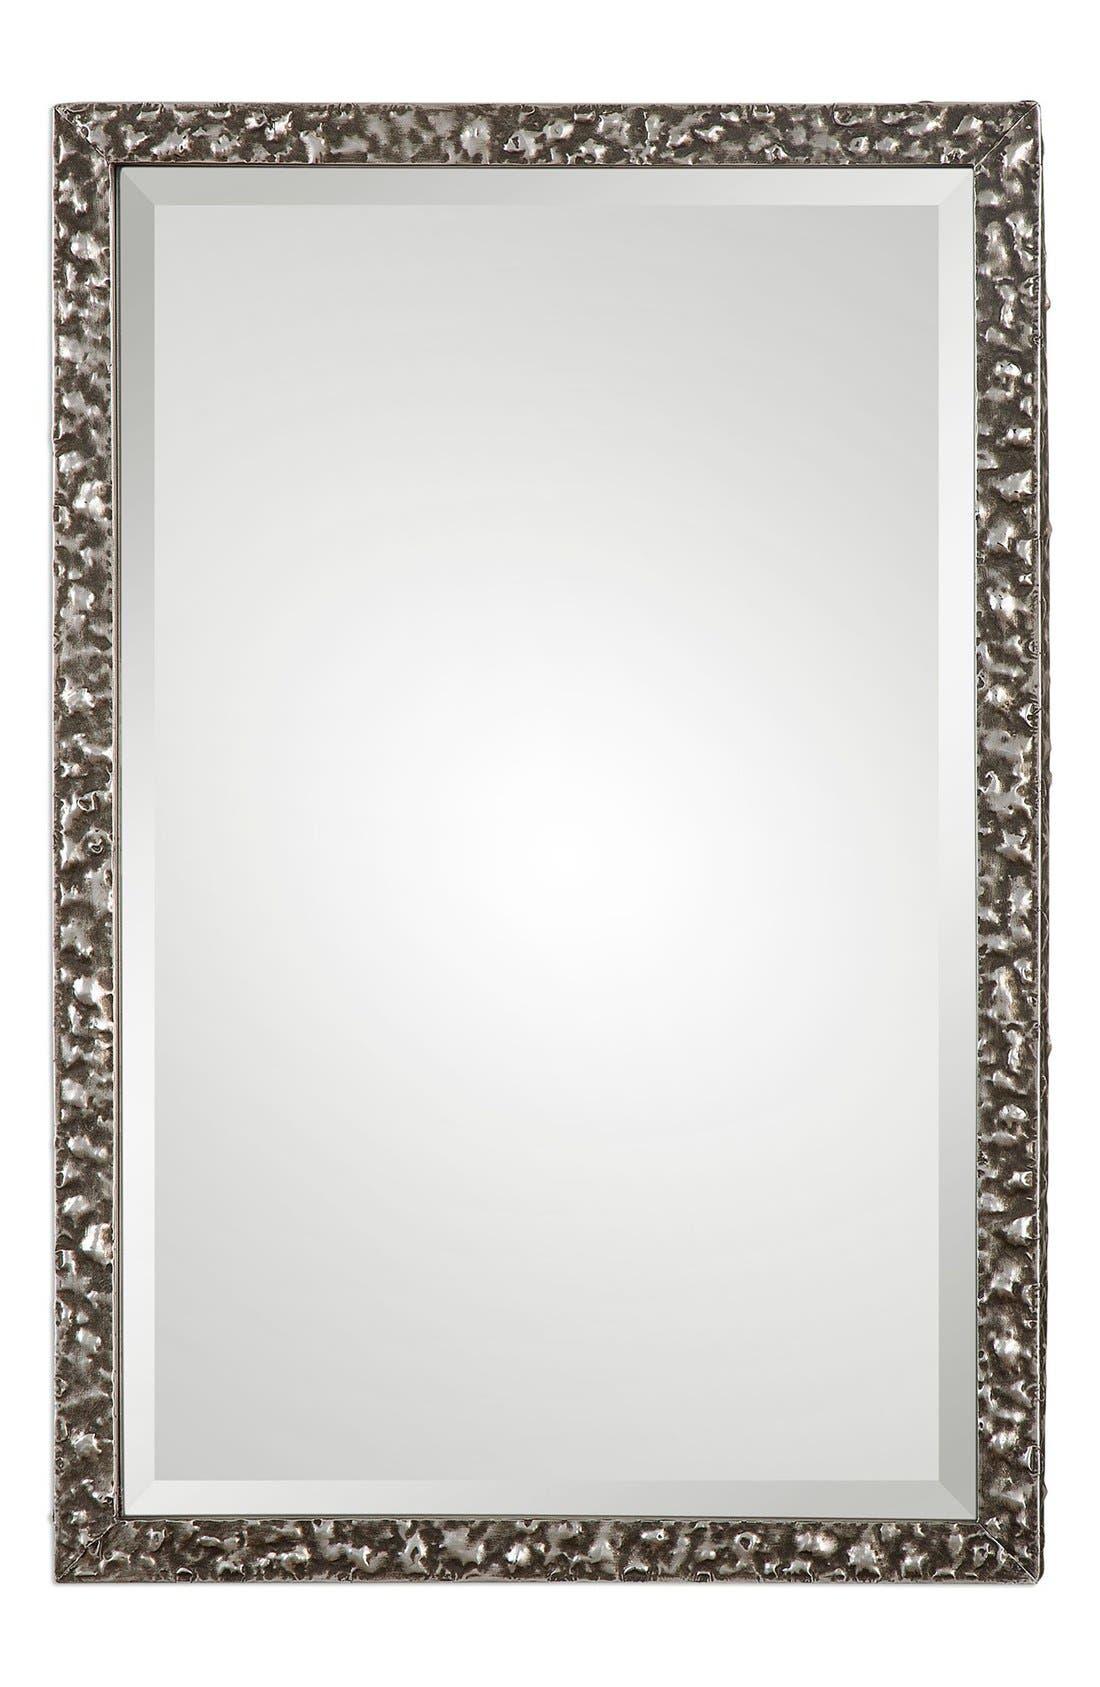 'Alshon' Rectangular Wall Mirror,                             Main thumbnail 1, color,                             020